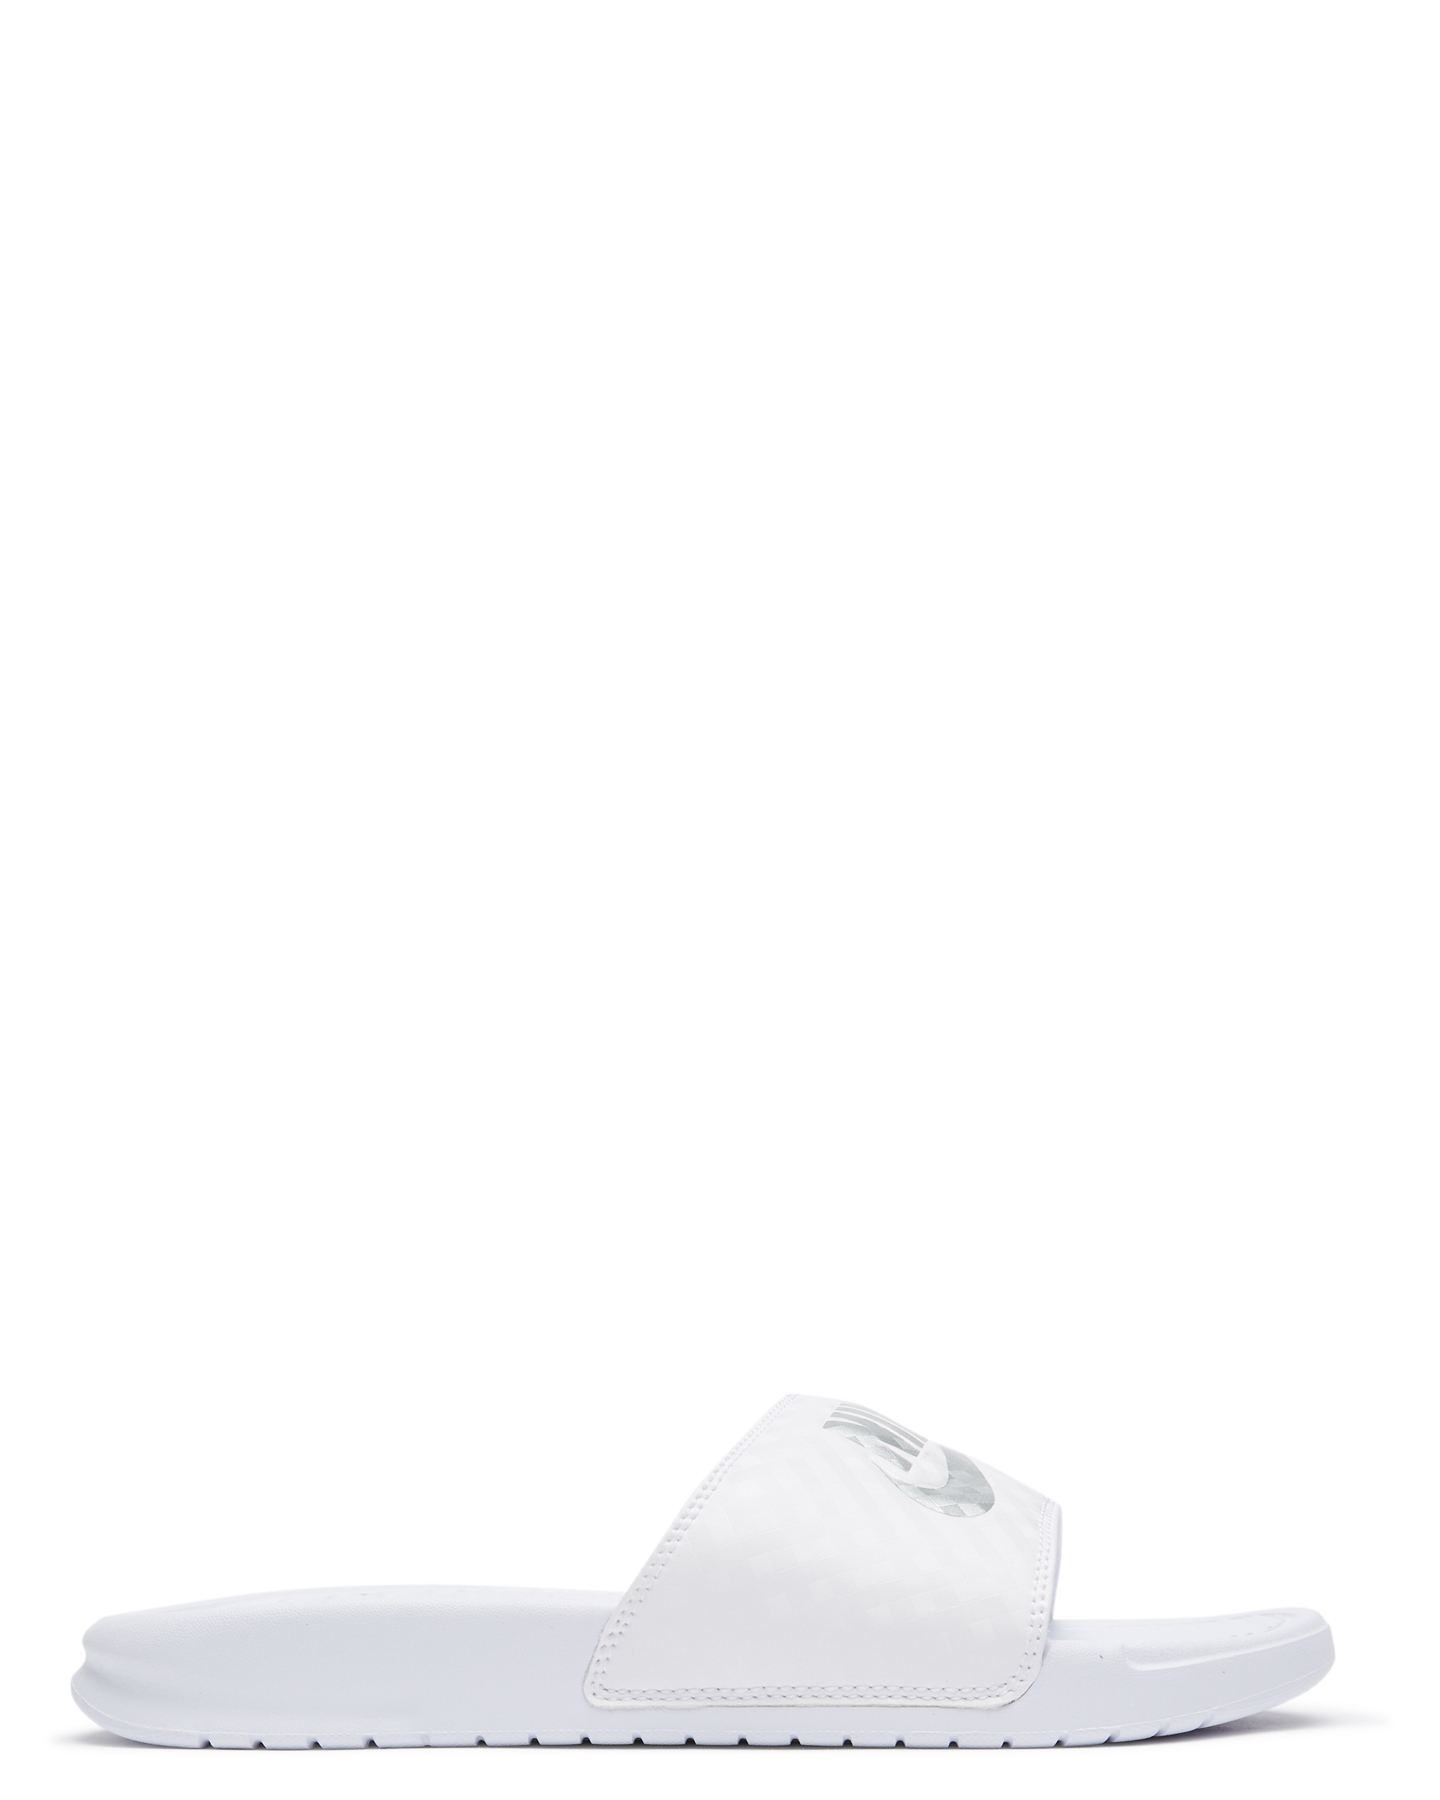 d199c4a0870dc4 Nike Womens Nike Benassi Slide Wht Metallic Silver Wht Metallic Silver